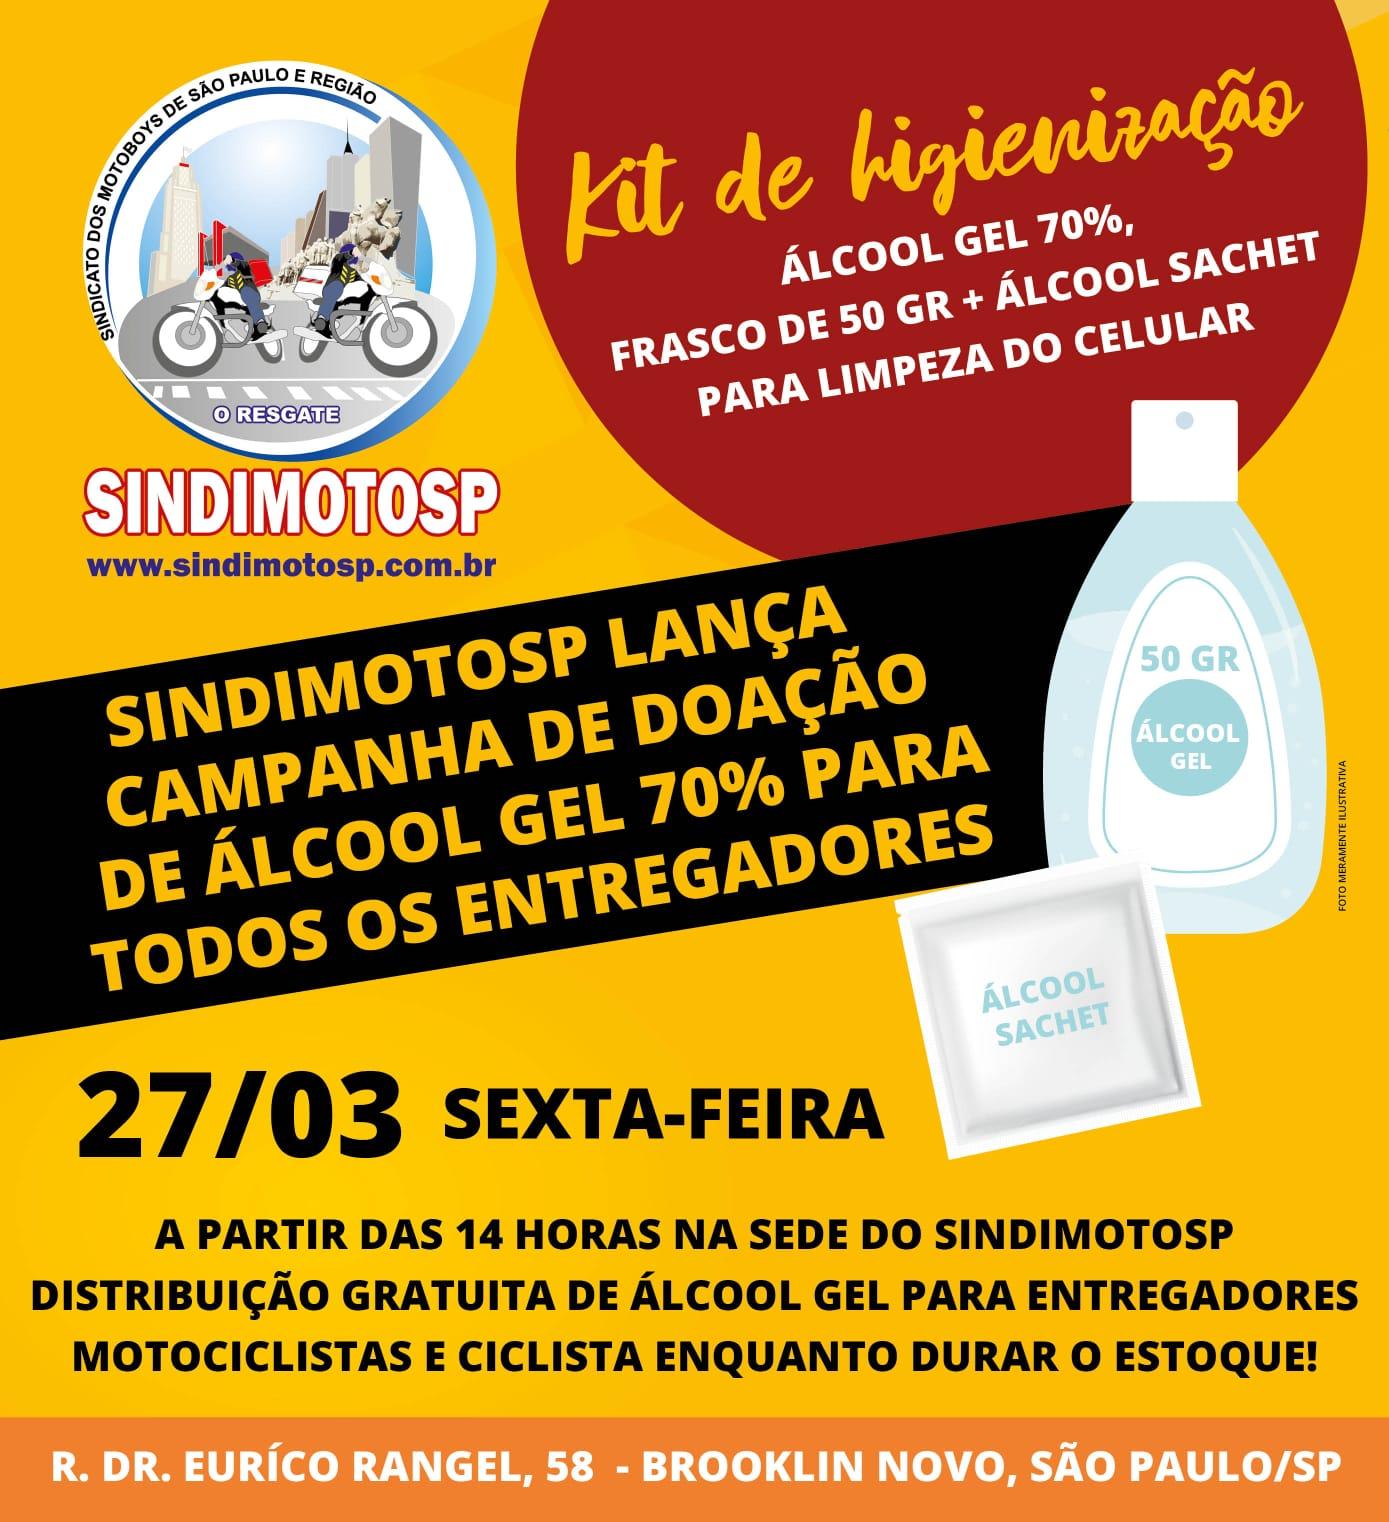 Sindimotosp-revista-moto-adventure_kit-gratuito-higienizacao